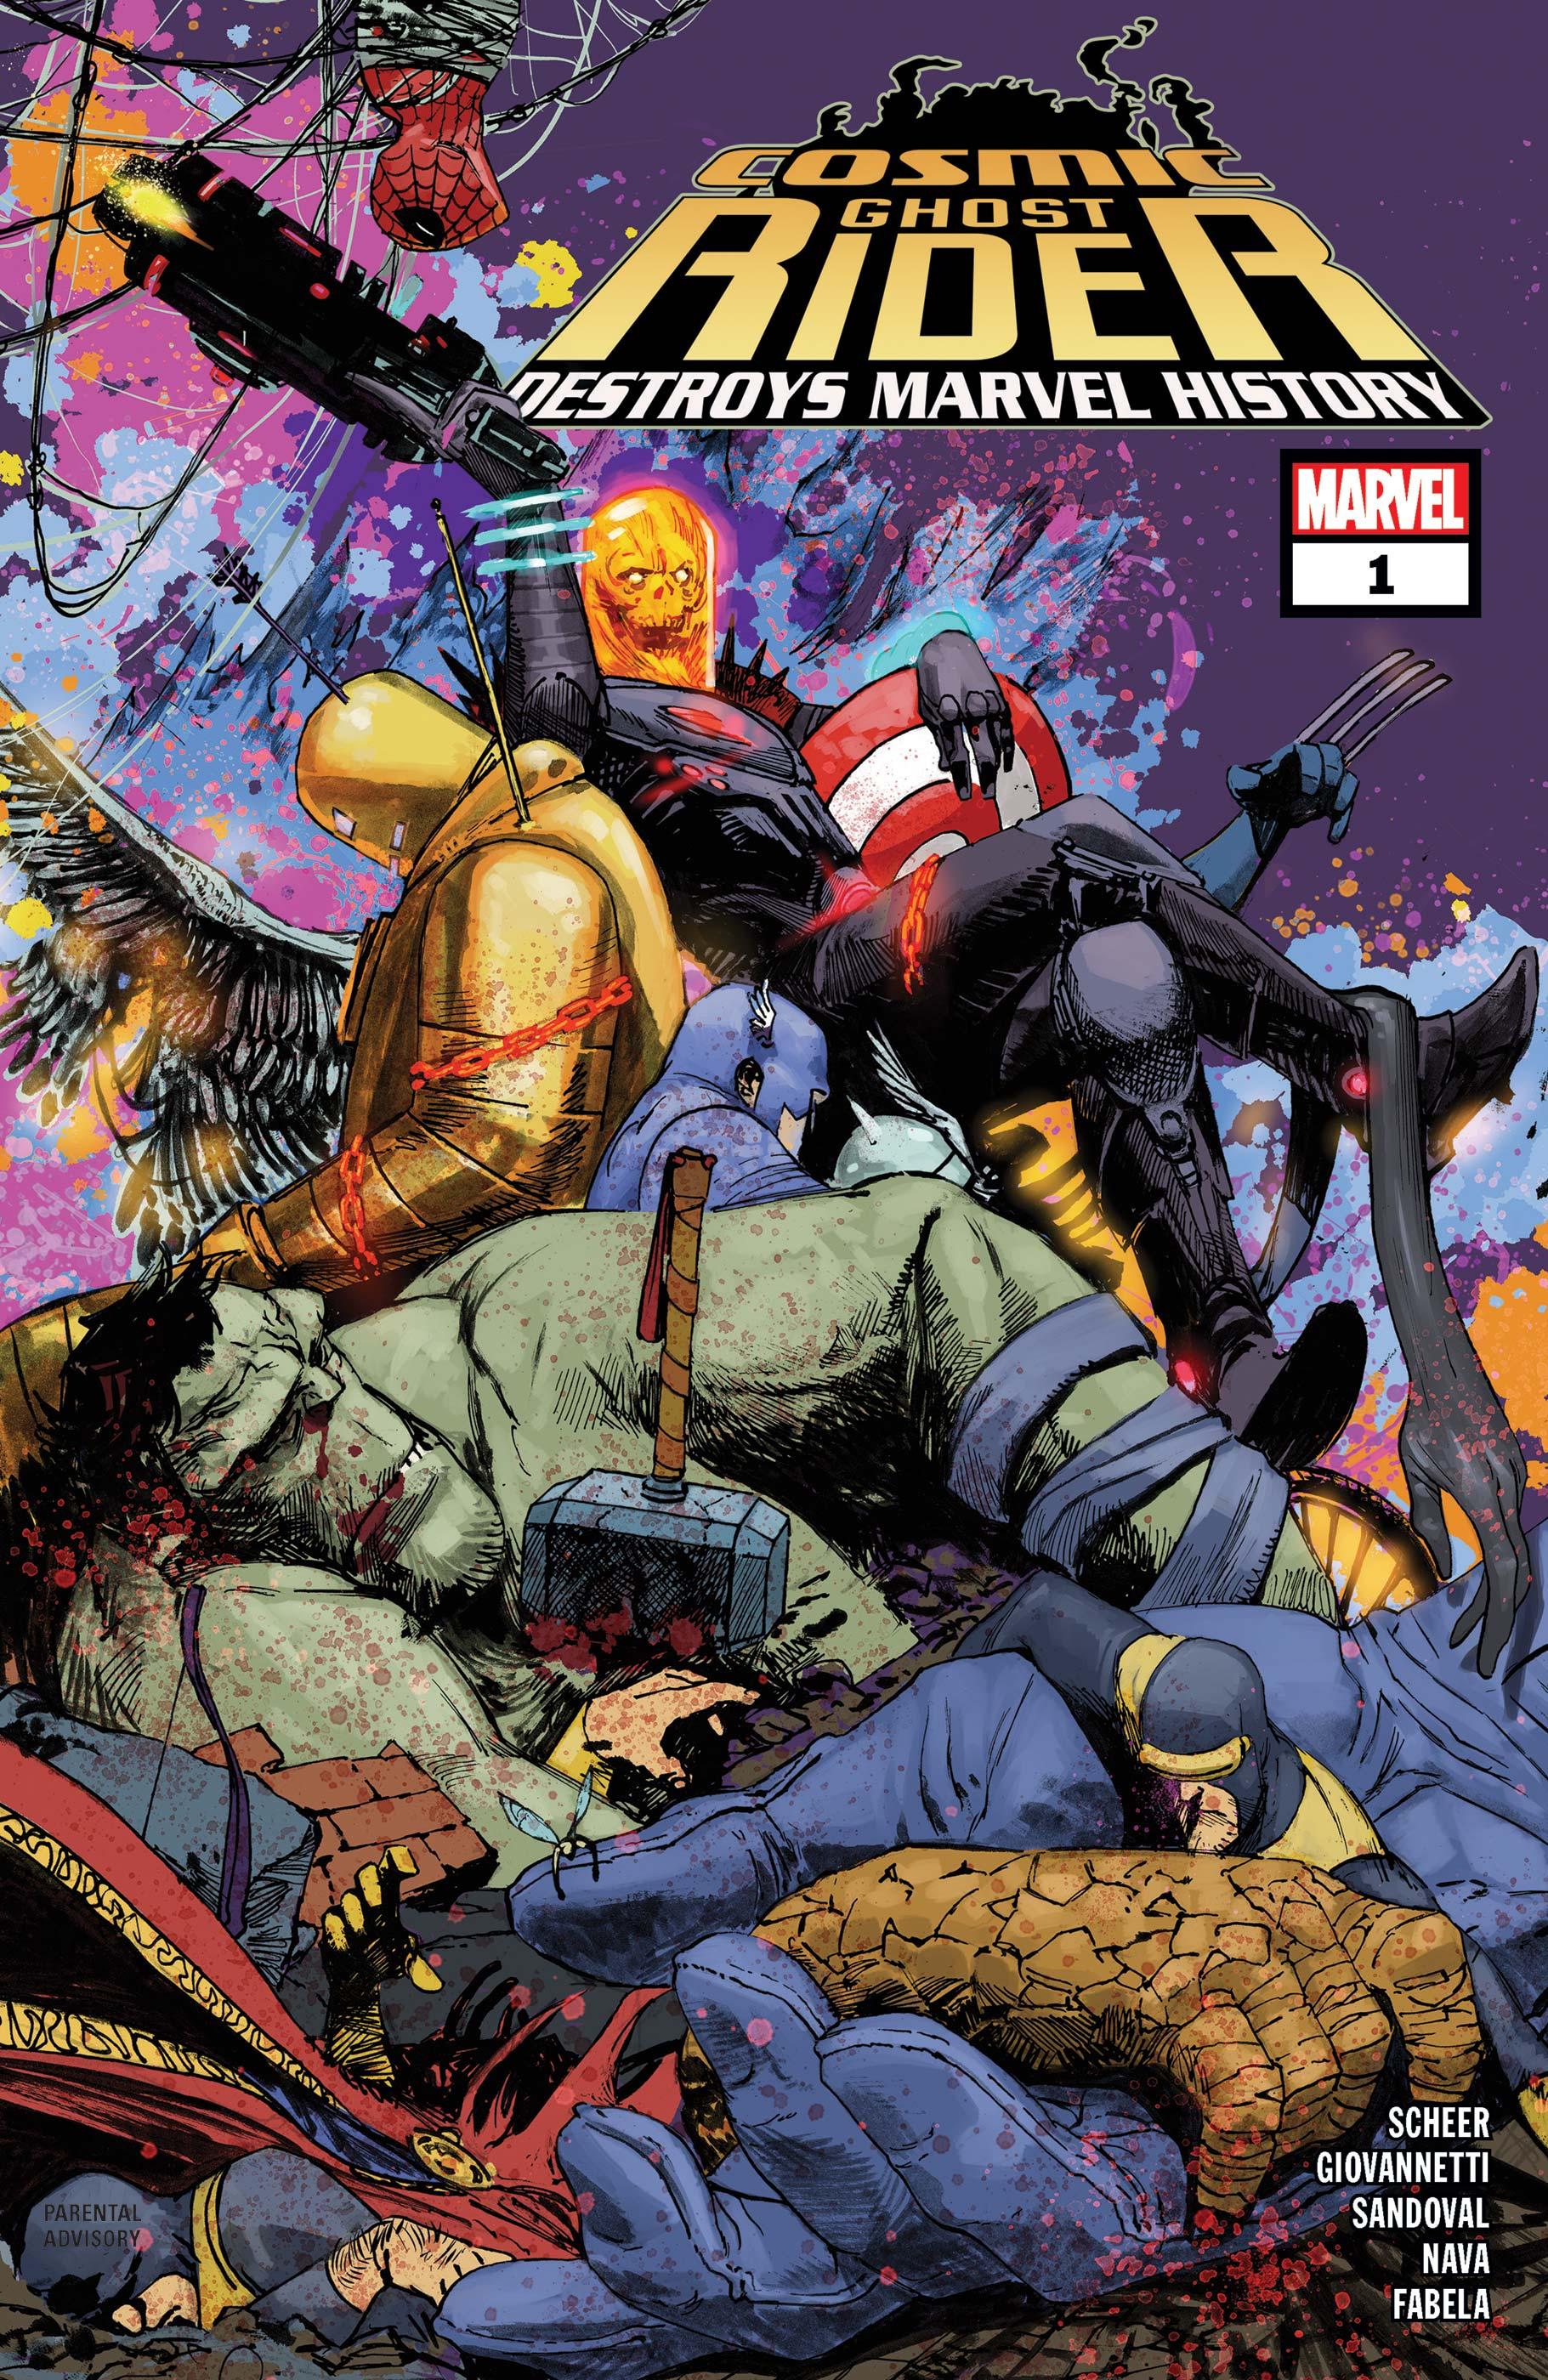 Cosmic Ghost Rider Destroys Marvel History (2019) #1